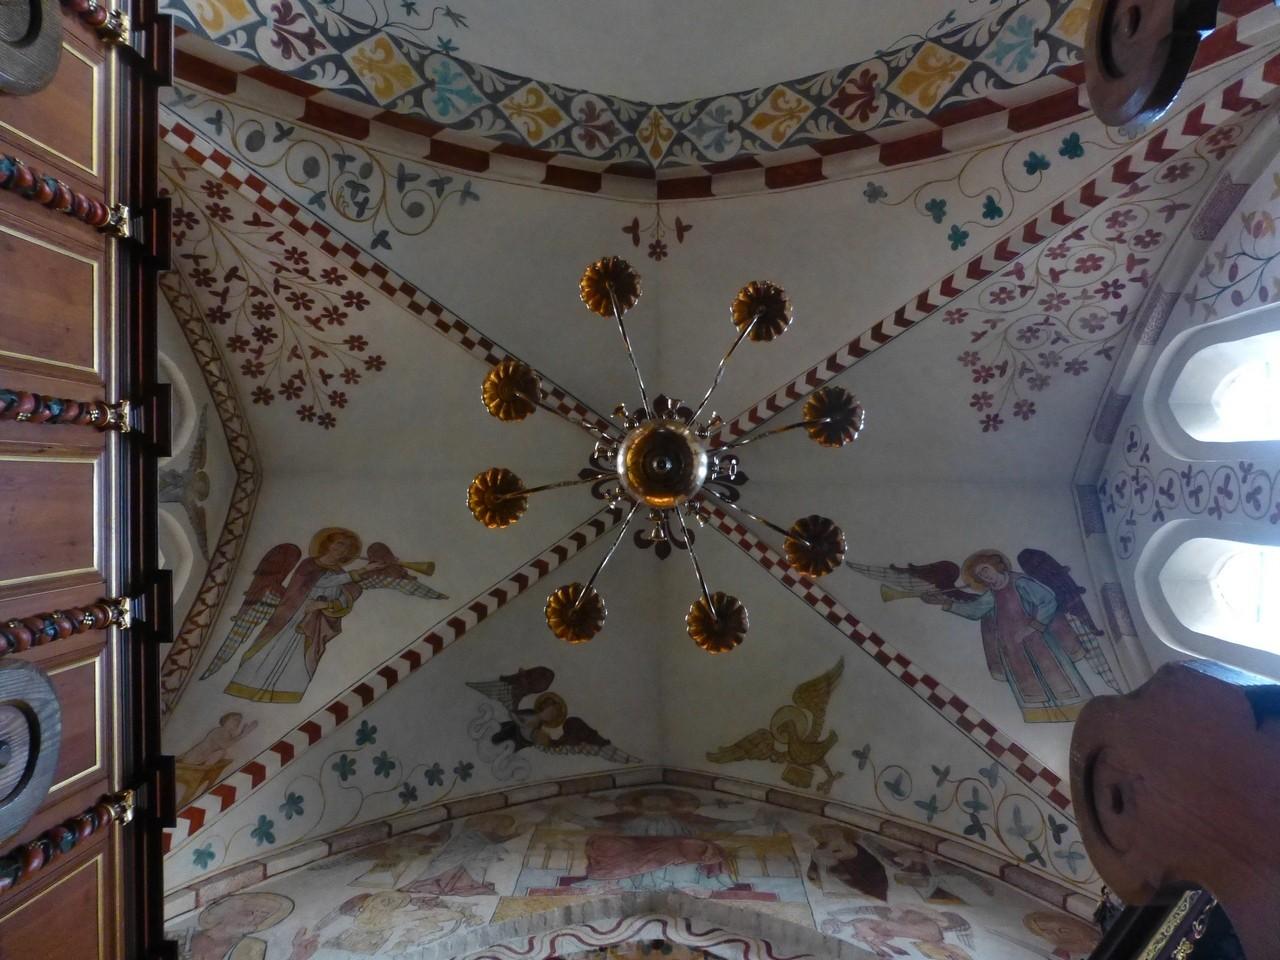 Maria-Magdalenen-Kirche zu Berkenthin - Kronleuchter 1 mit Deckenmalerereien /Foto P.Lüneburg